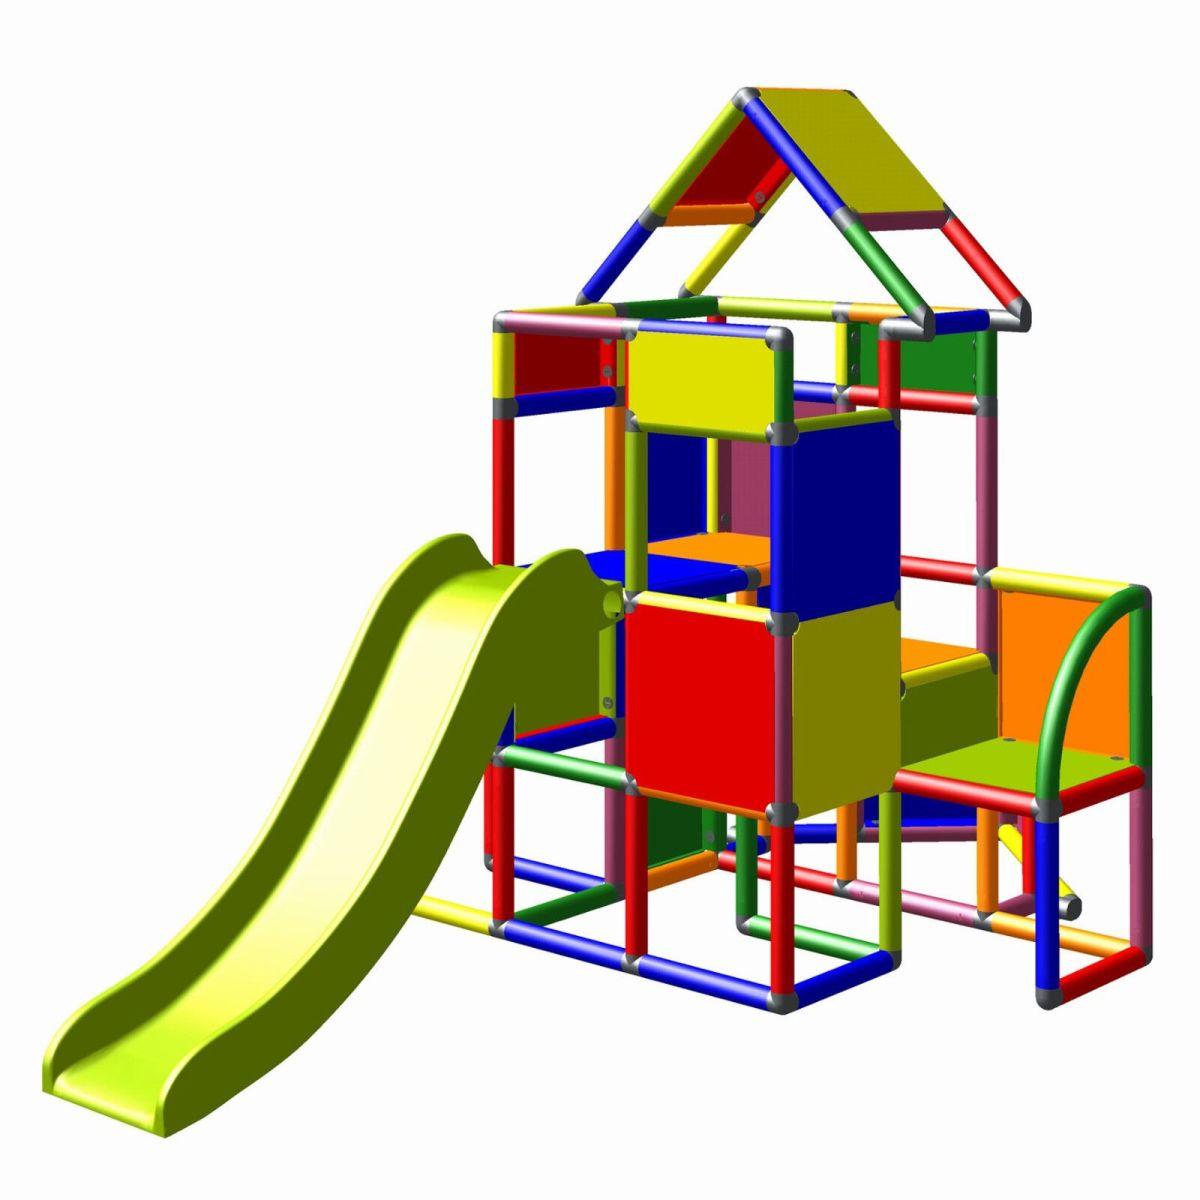 Moveandstic großer Spielturm Lisa mit Rutsche Kletterturm multicolor Baukasten